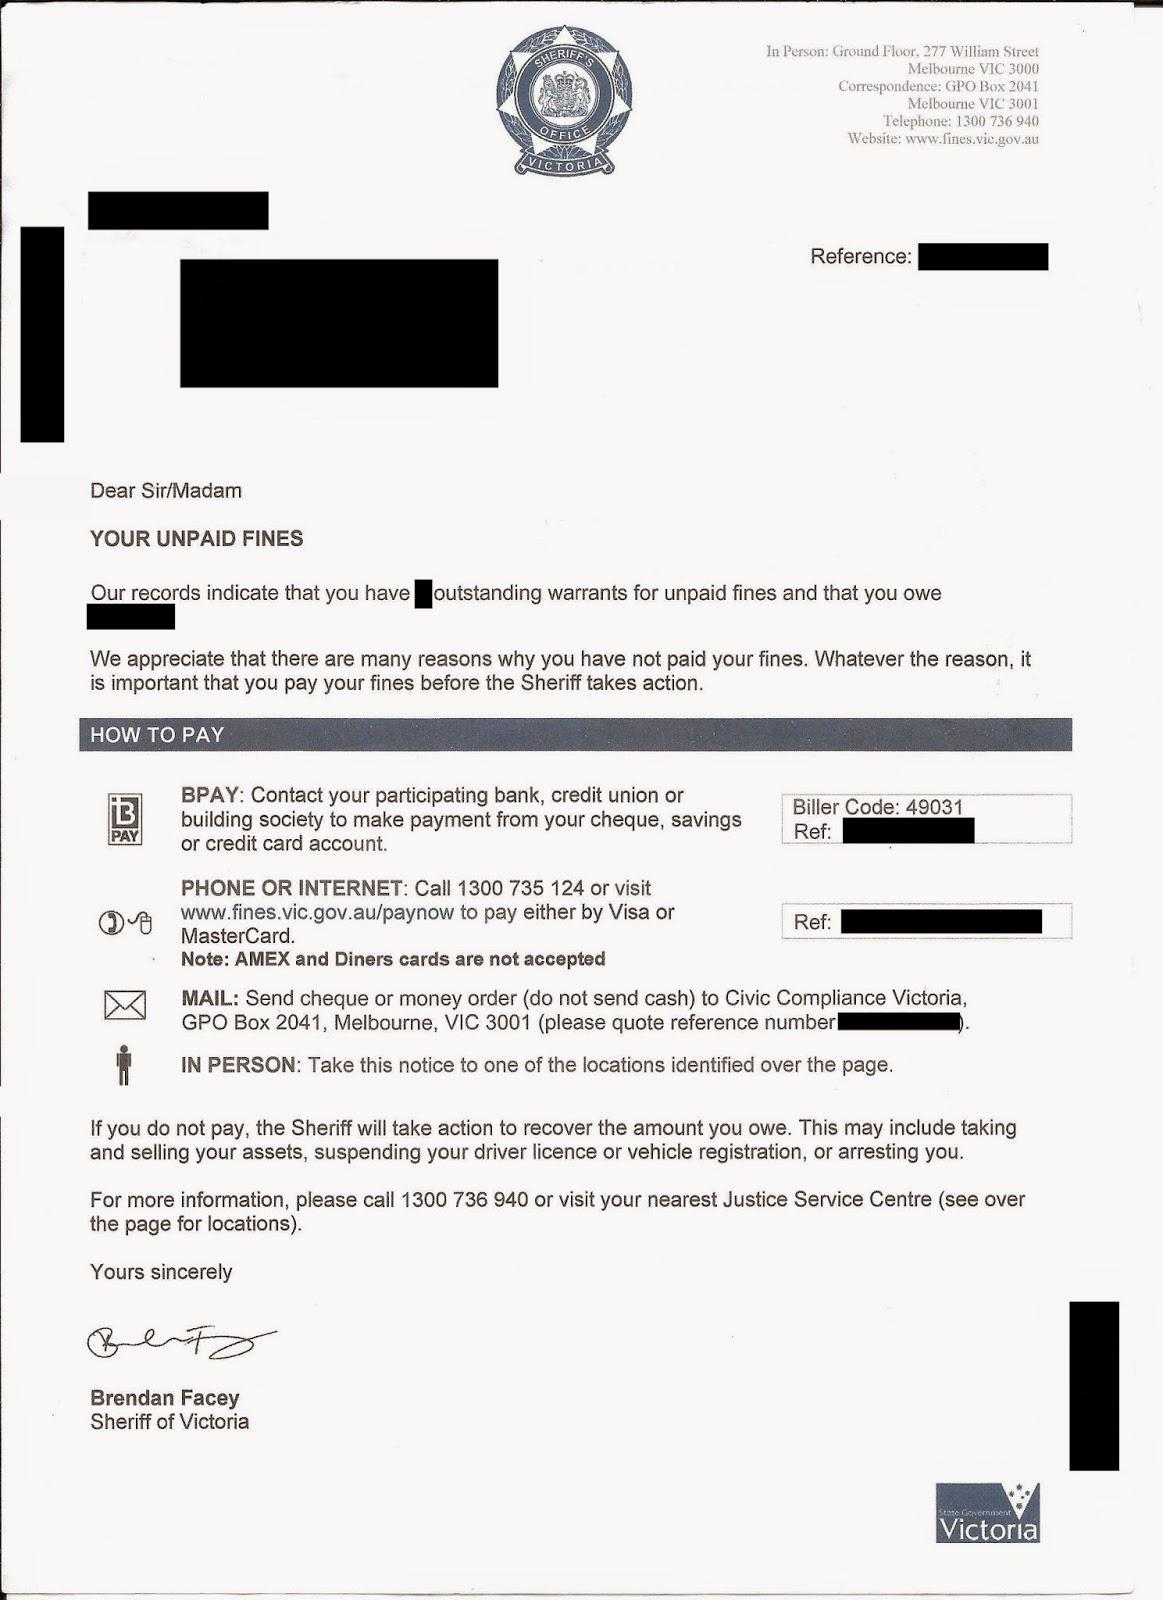 Corporate Australia The Unlawful Signature Of Victoria S Sheriff